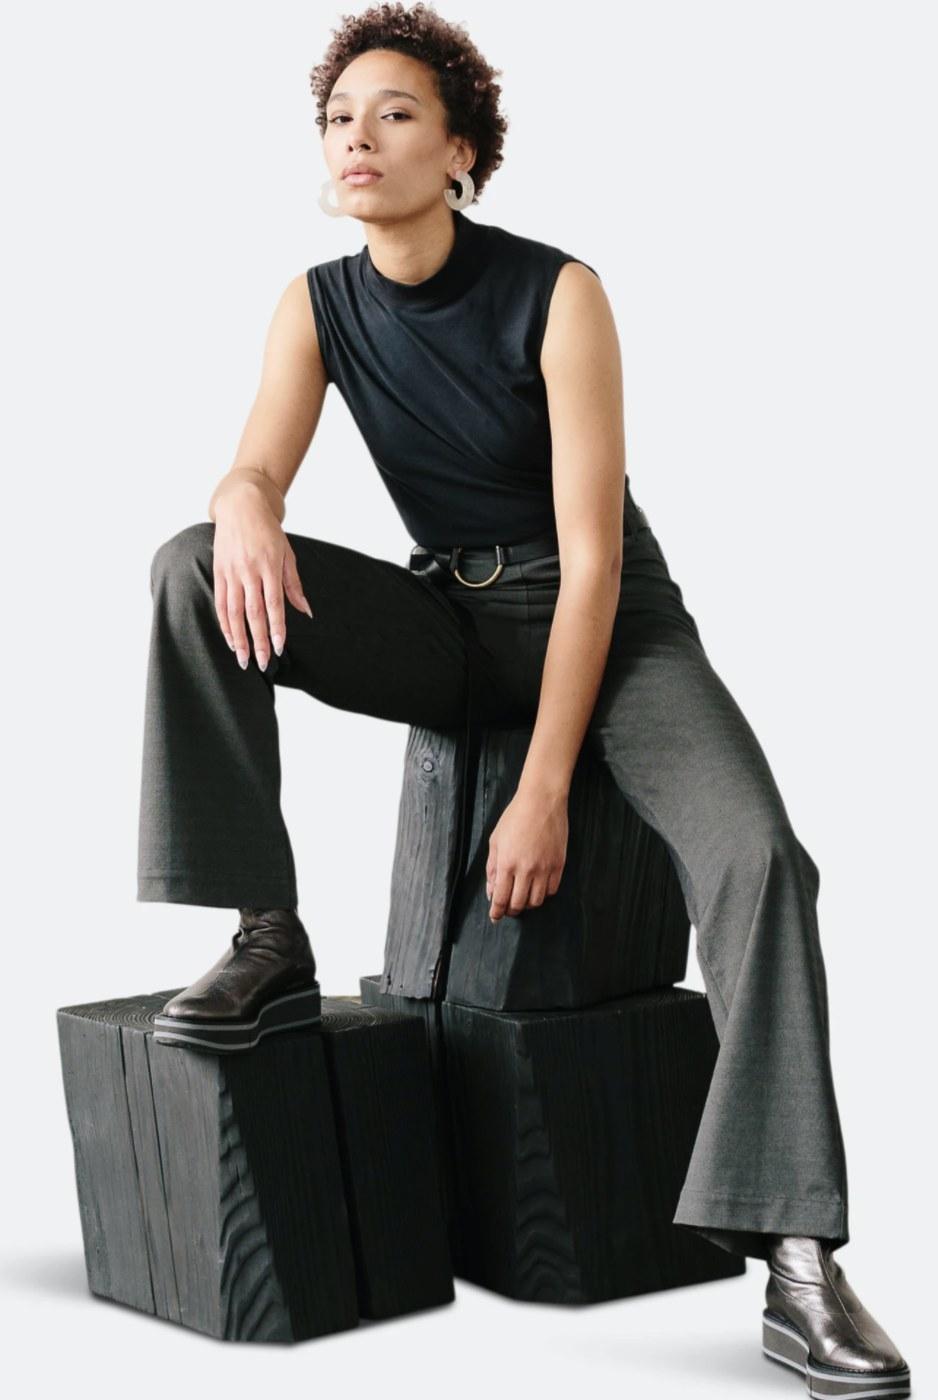 model wearing the pants in grey